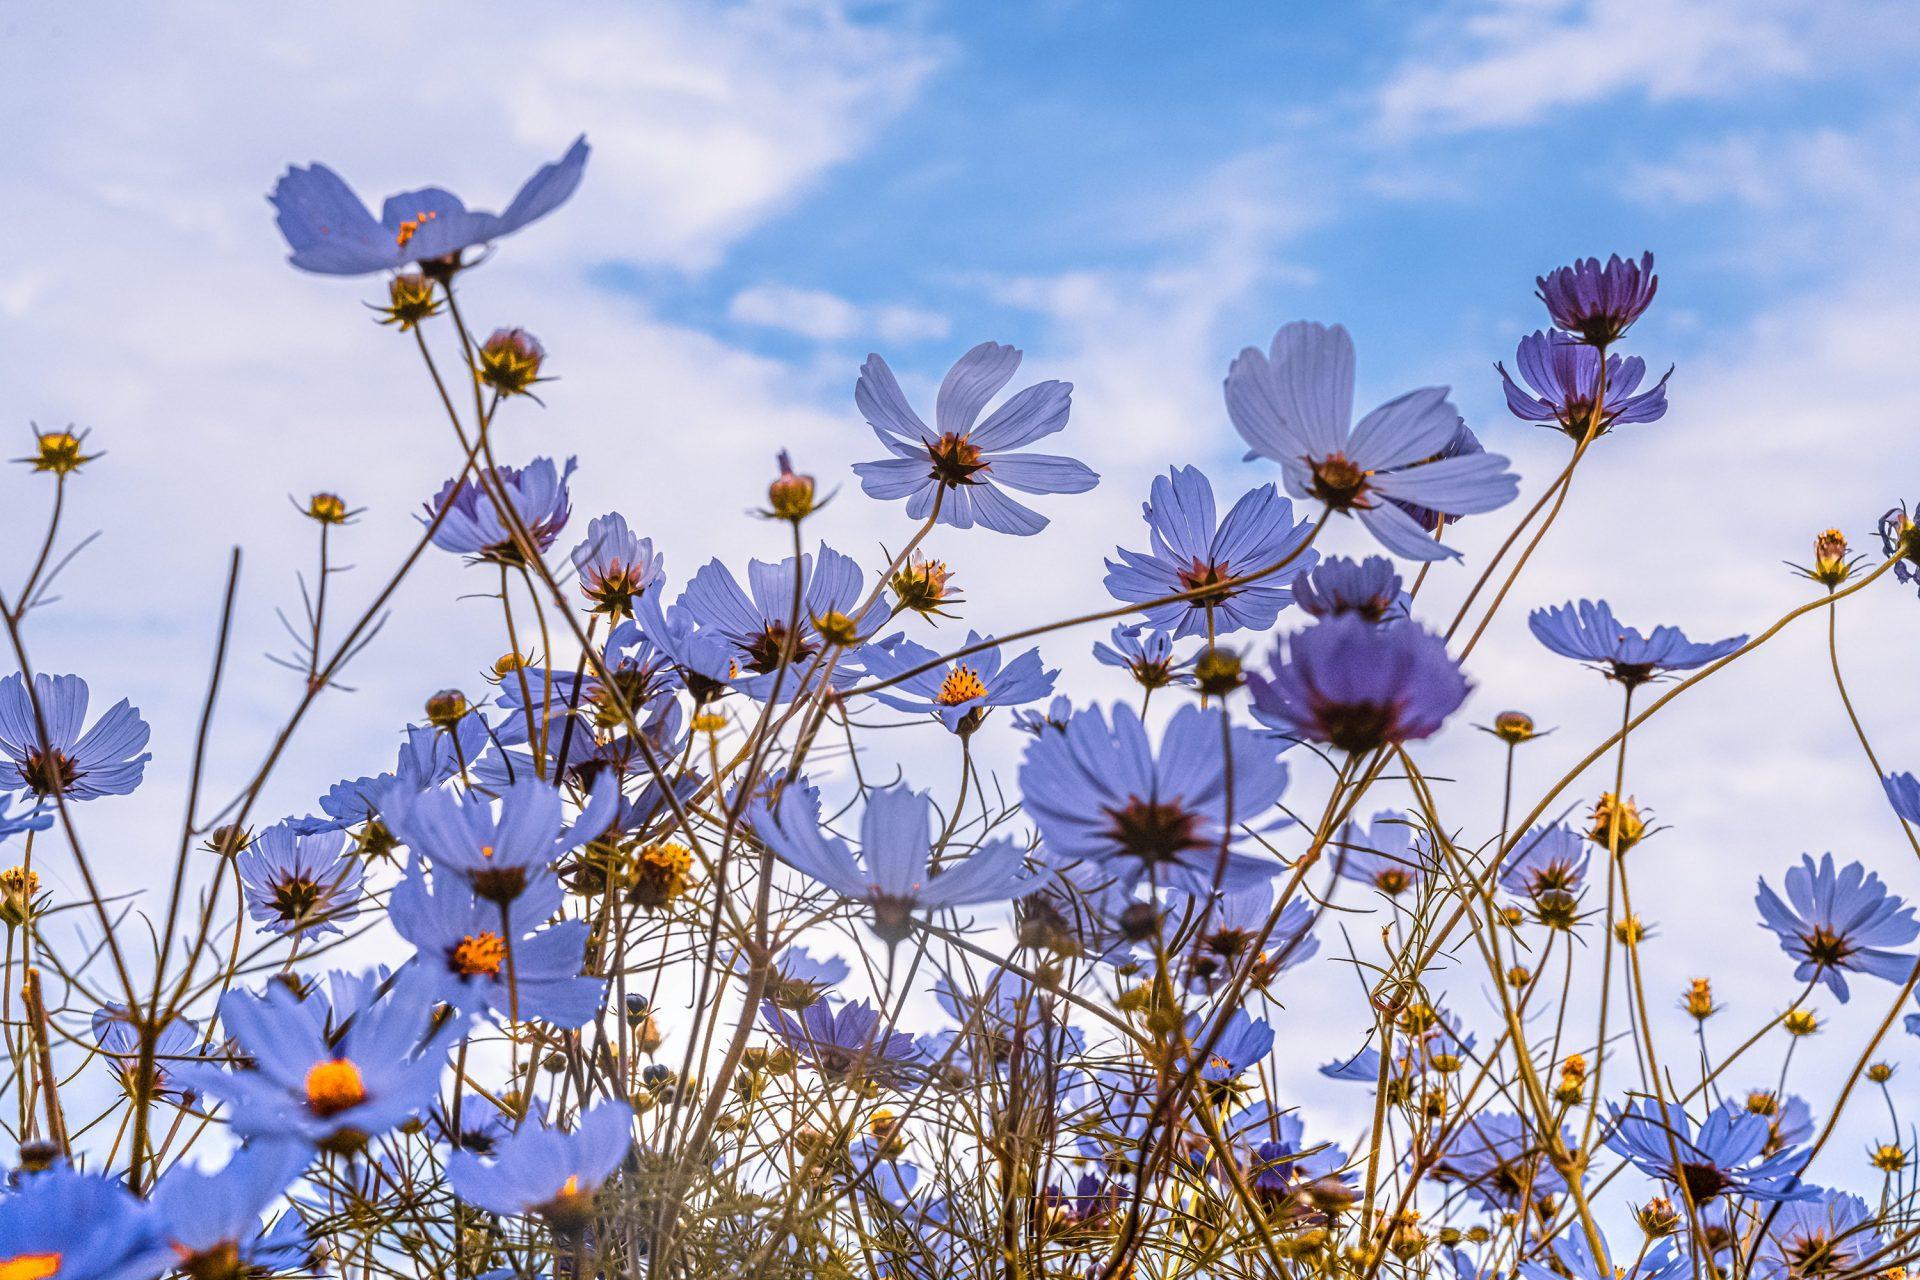 Photo by yue su on Unsplash